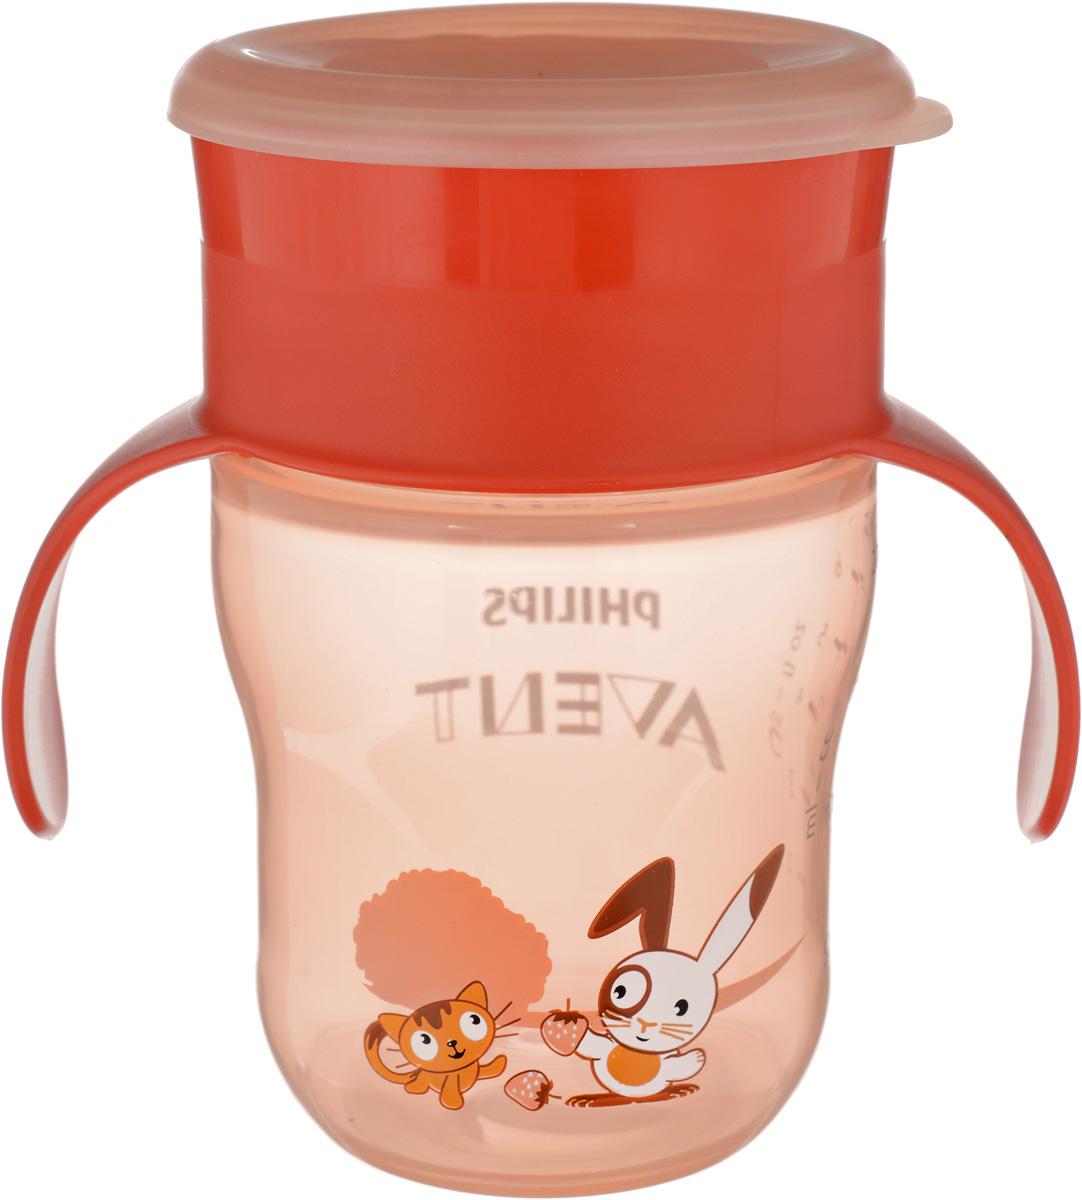 Philips Avent Чашка-поильник от 12 месяцев цвет оранжевый 260 мл philips bdp 2180k 51